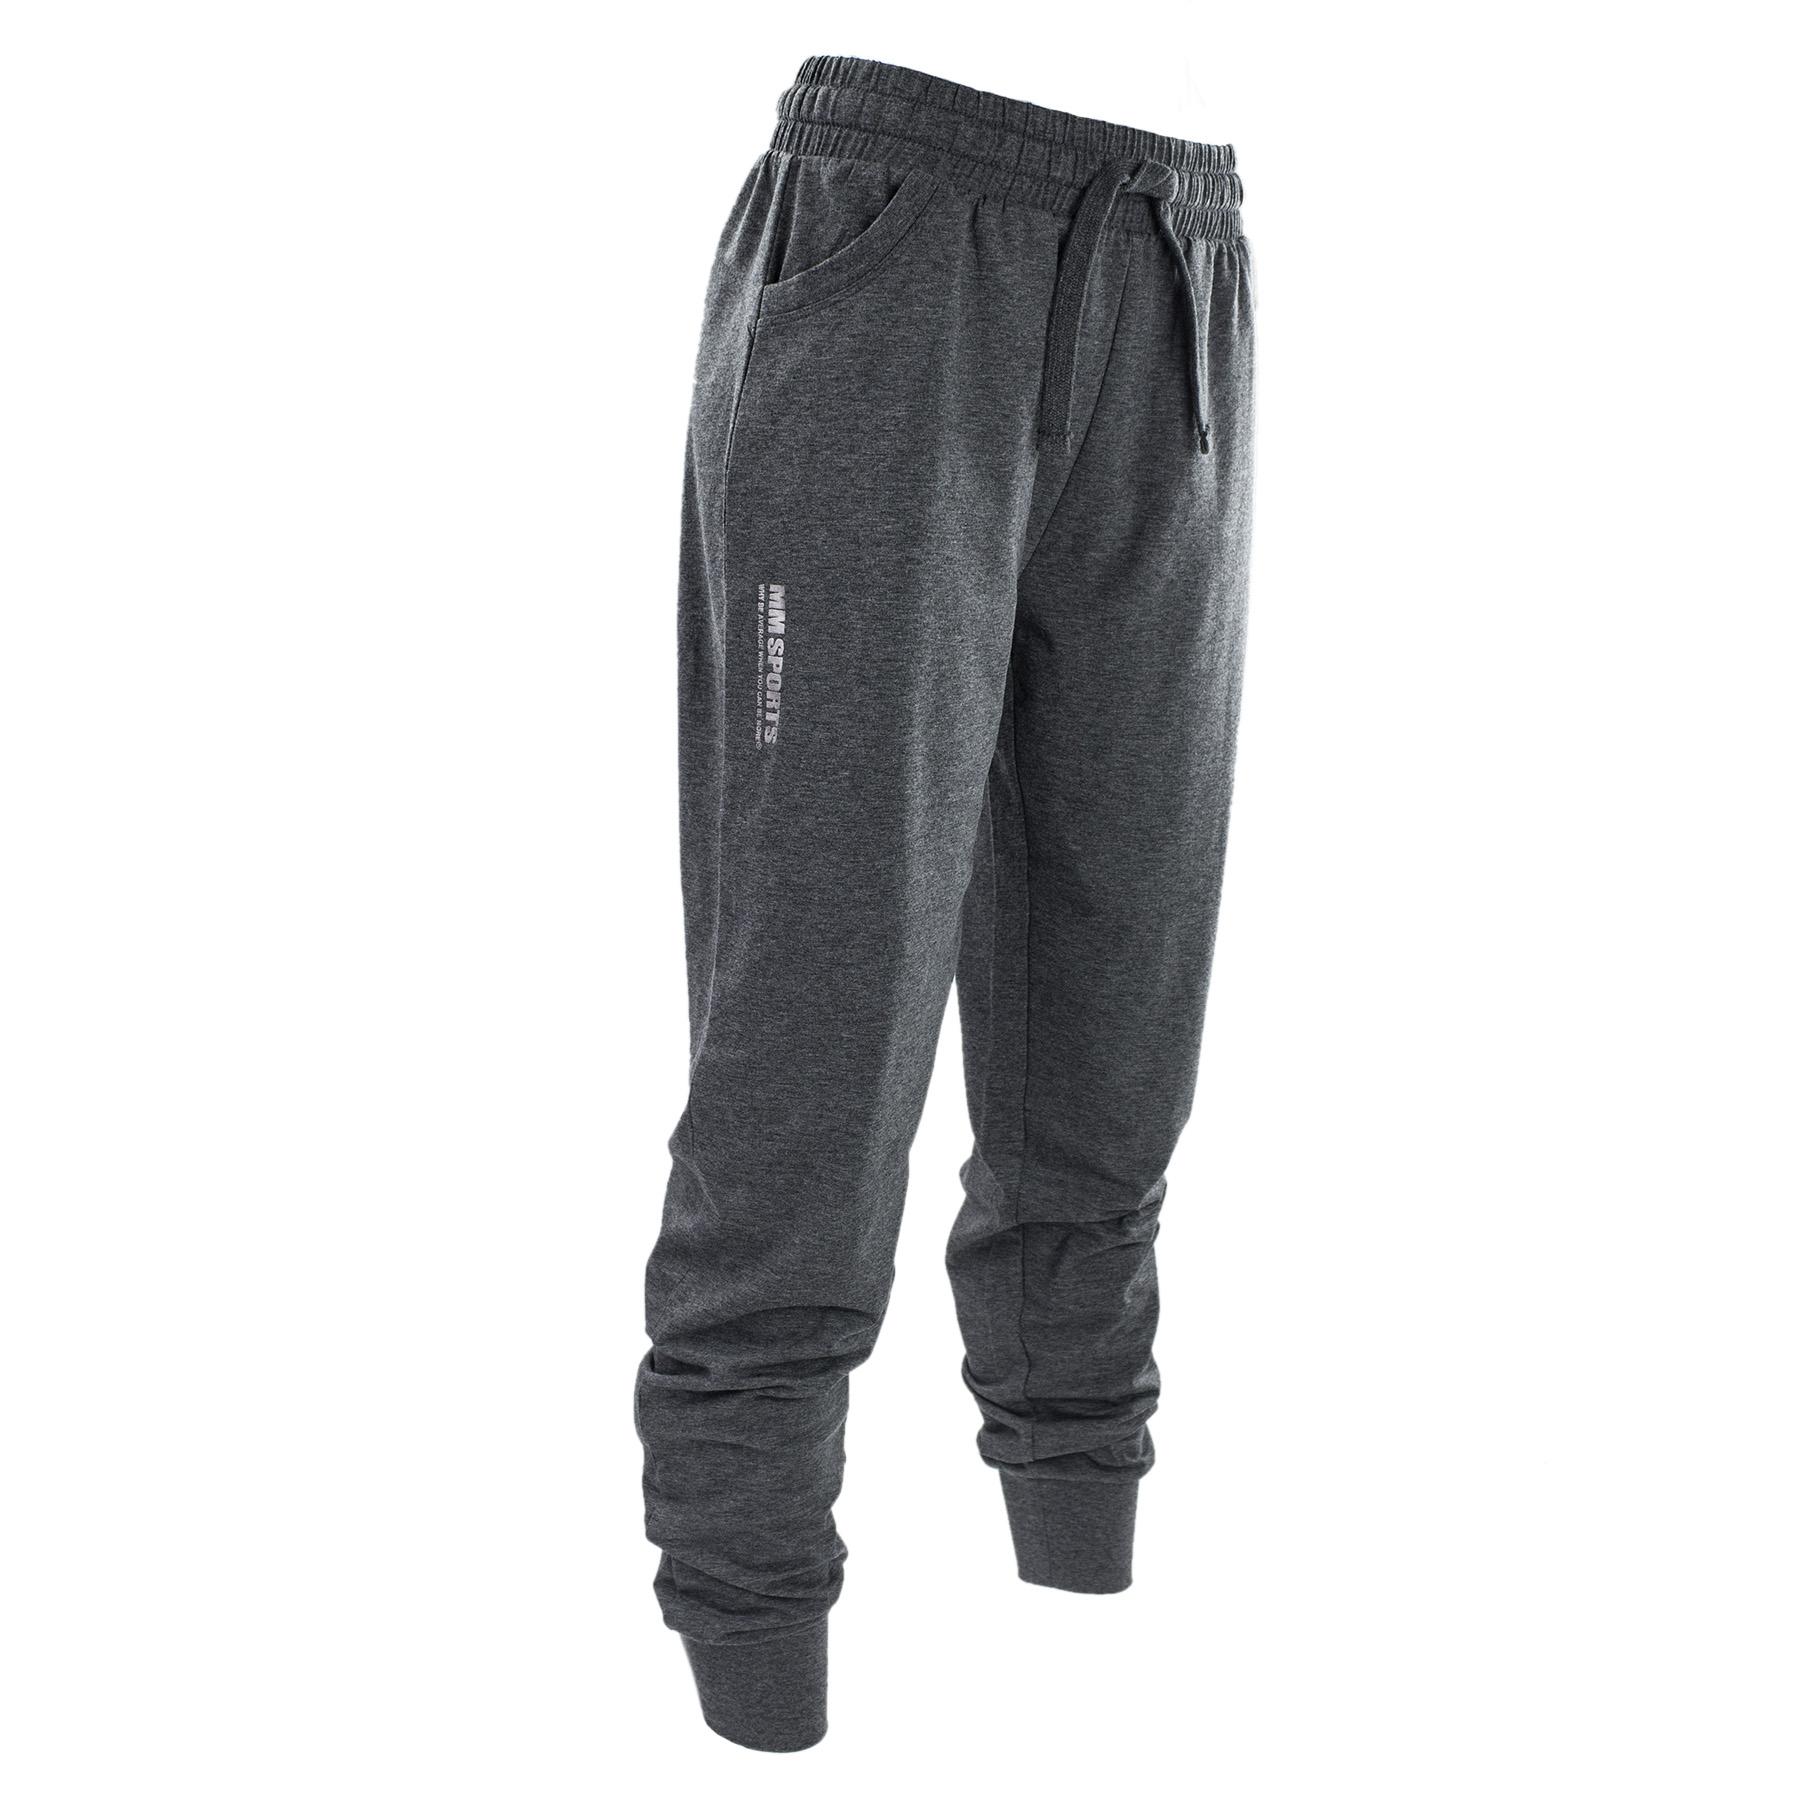 Pants Tahnee, Dark Greymelange